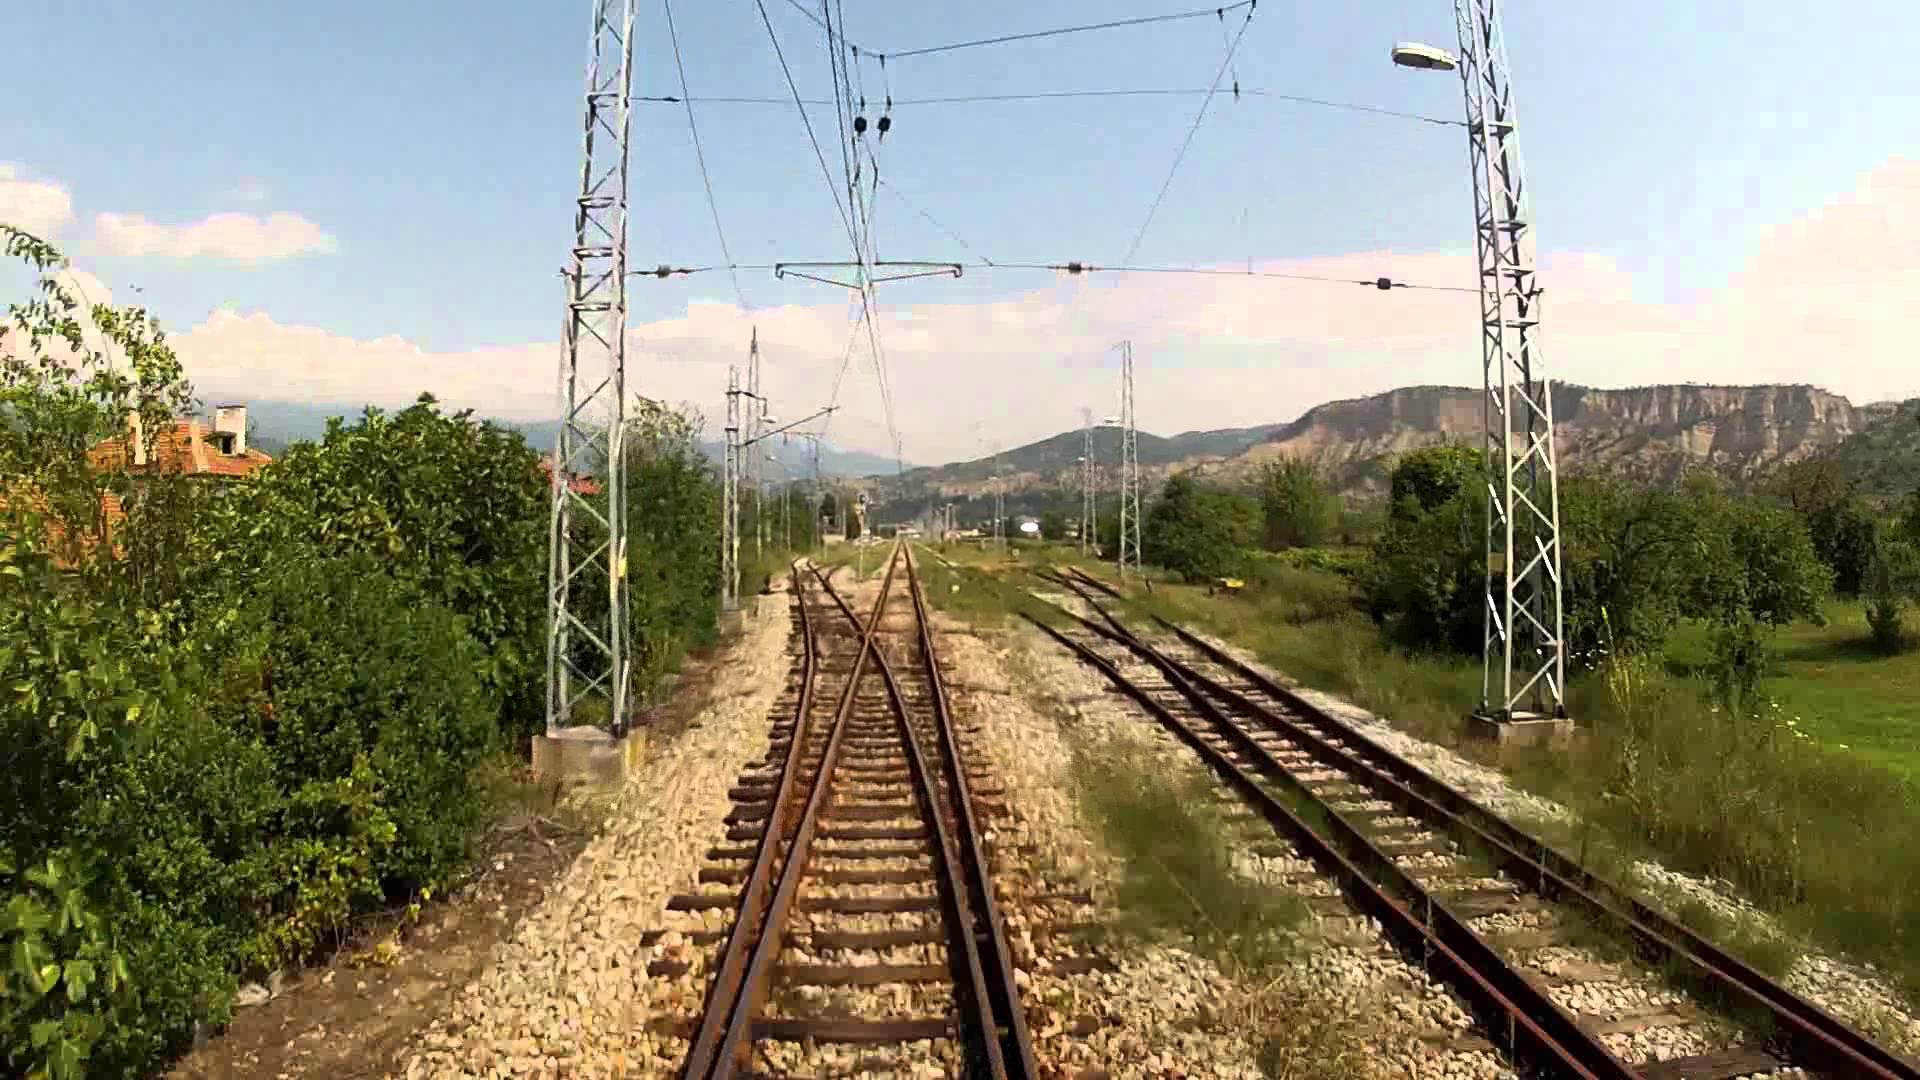 Driver's view of Struma railway Kulata – Blagoevgrad, incl. Kresna gorge